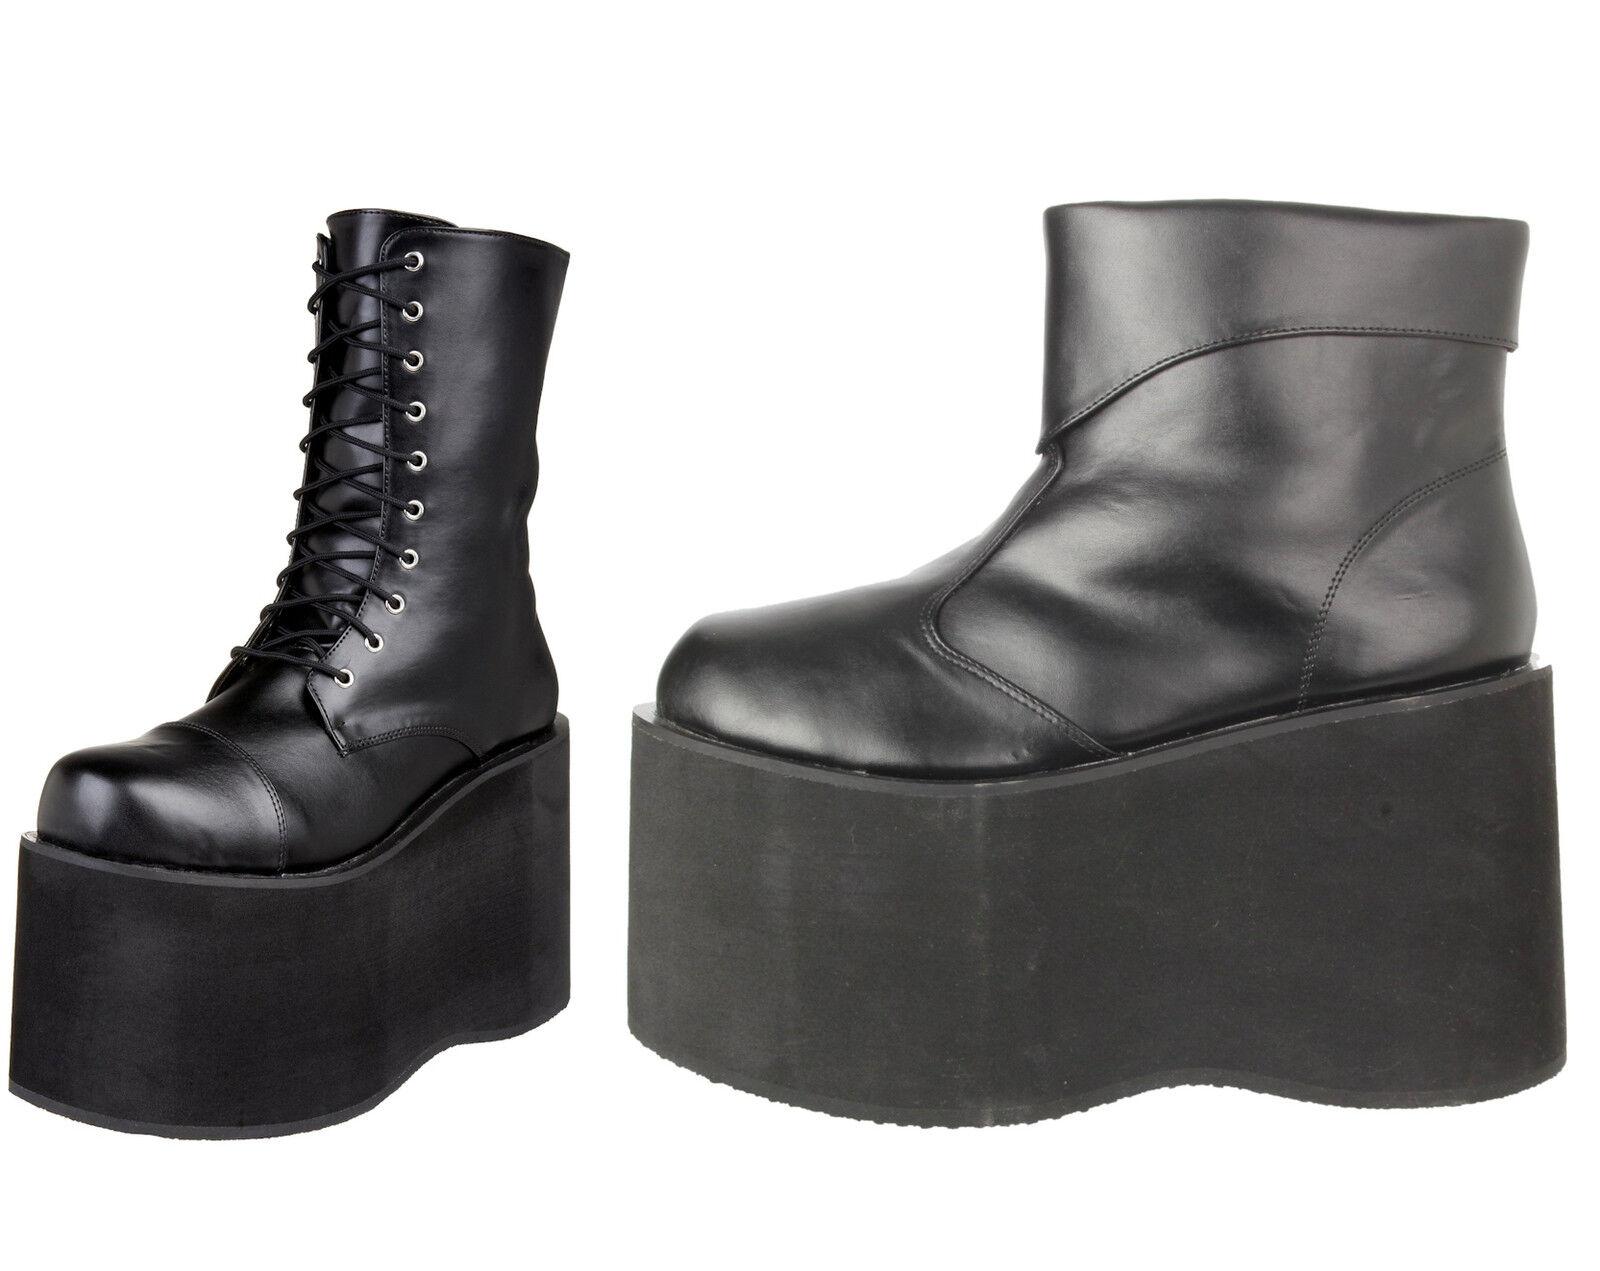 Funtasma Monster-02 Monster-10 Men's Frankenstein platform Frankenstein Men's Halloween Boots 883991